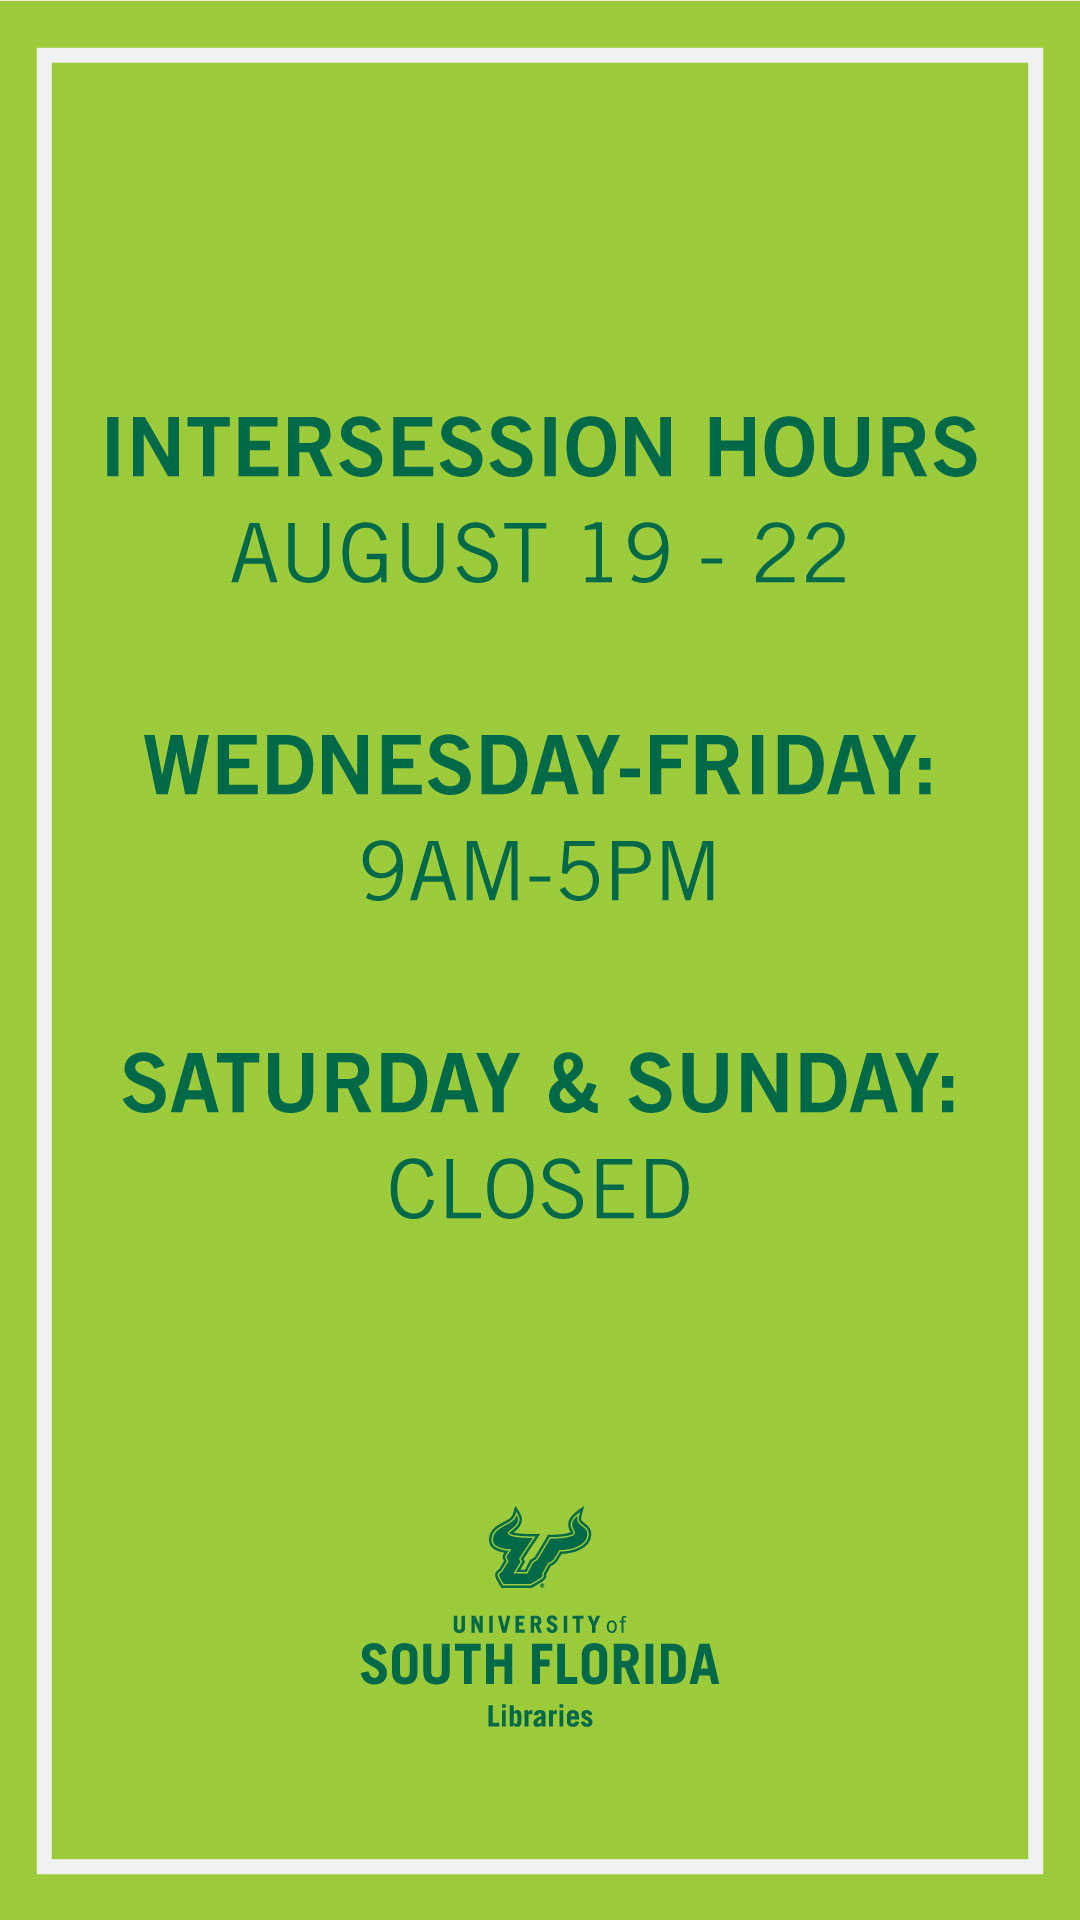 reopening-digi-intersession-hours-V-sunday